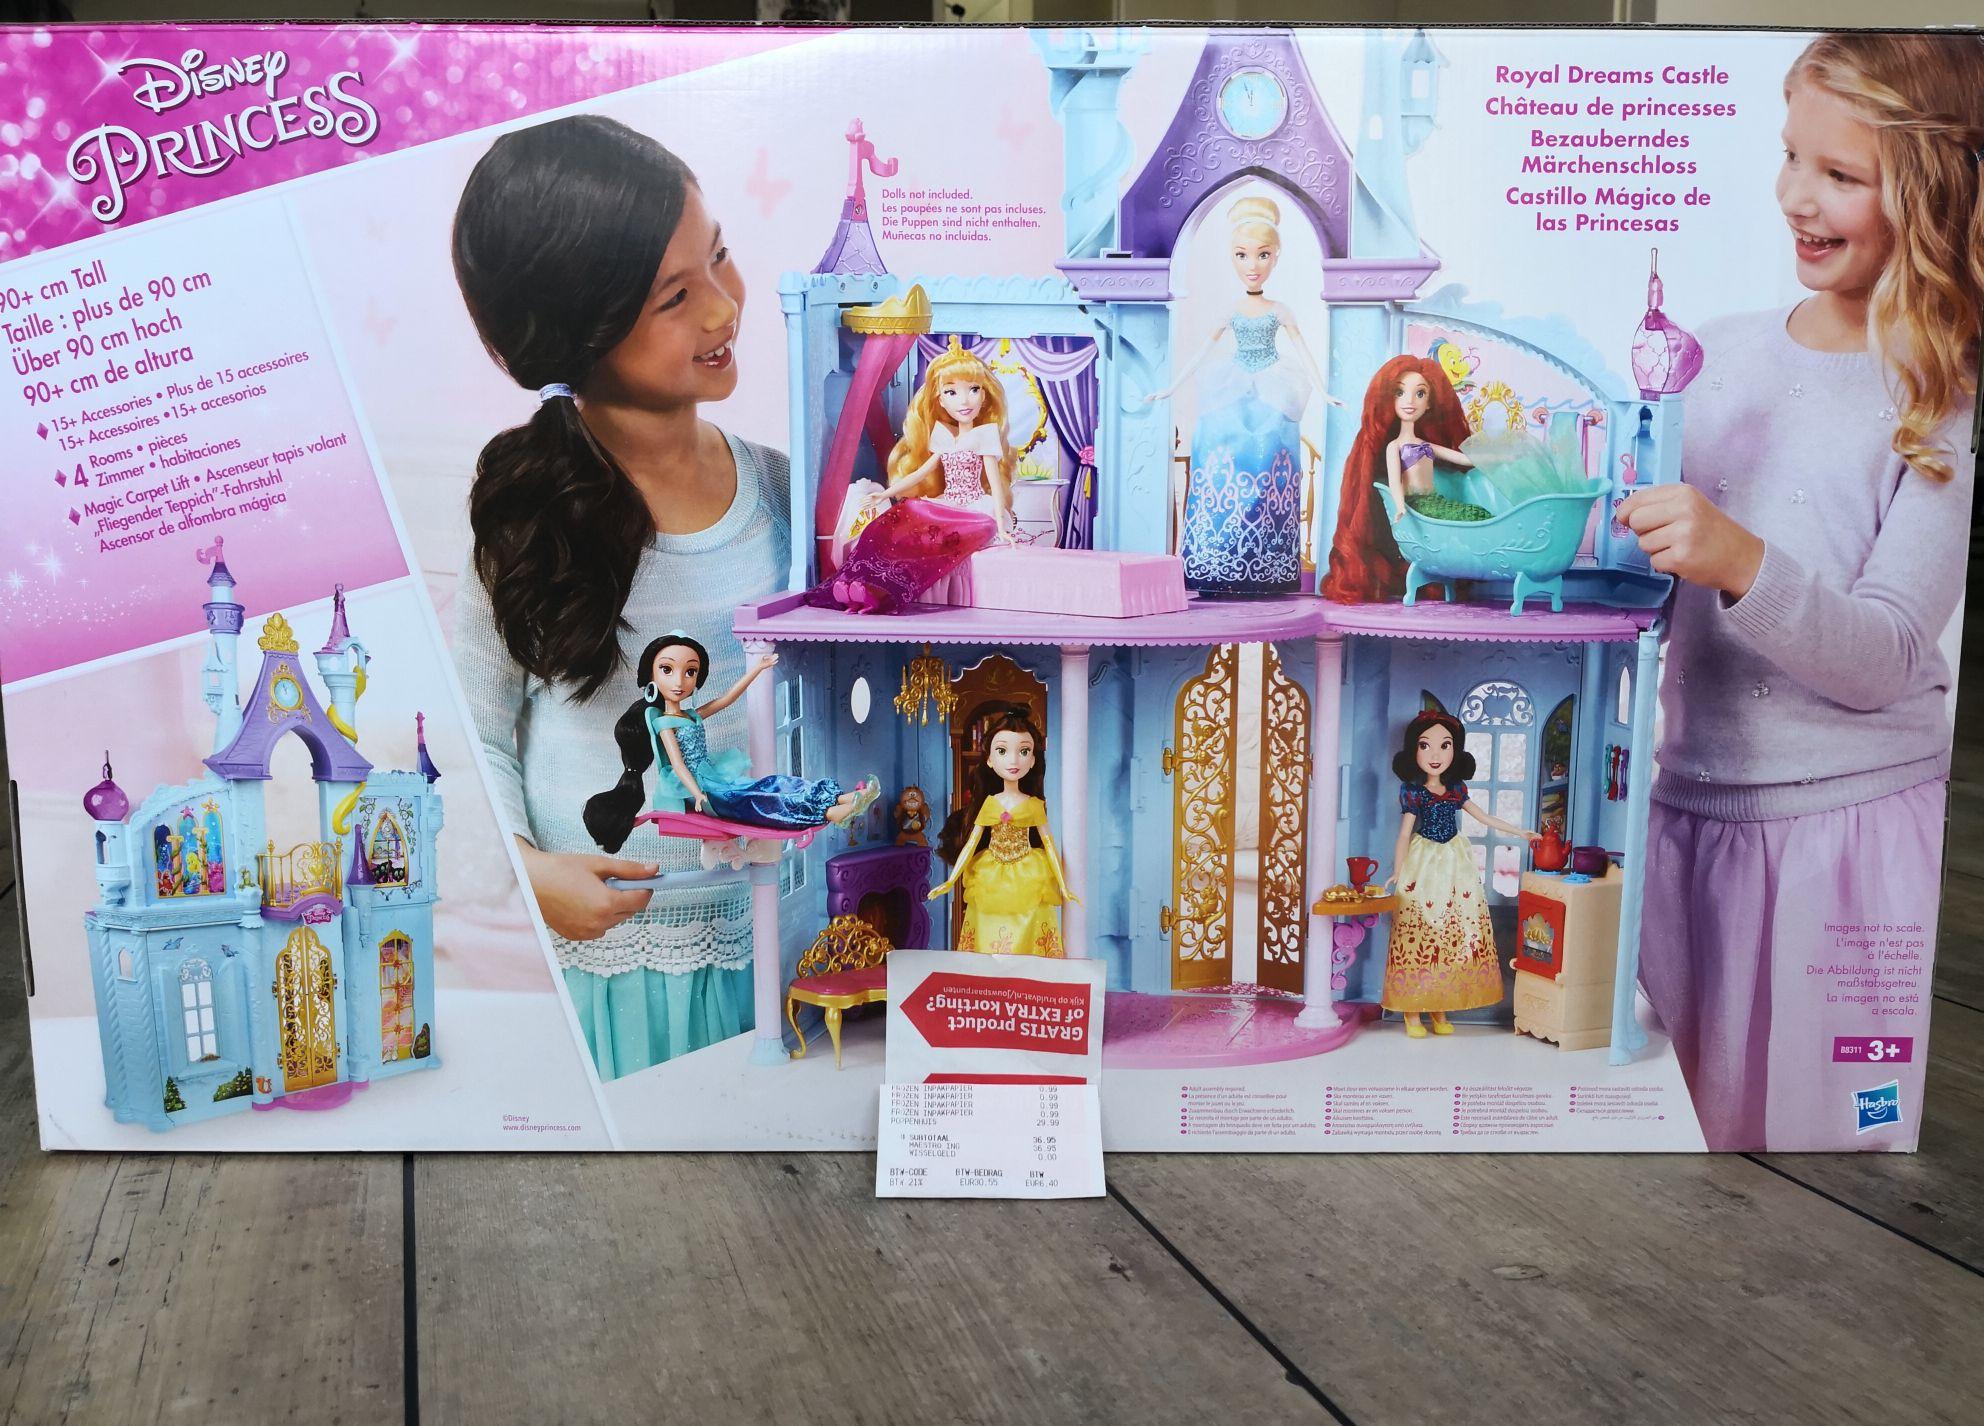 Disney prinsessenkasteel 90cm (lokaal bij de kruidvat)